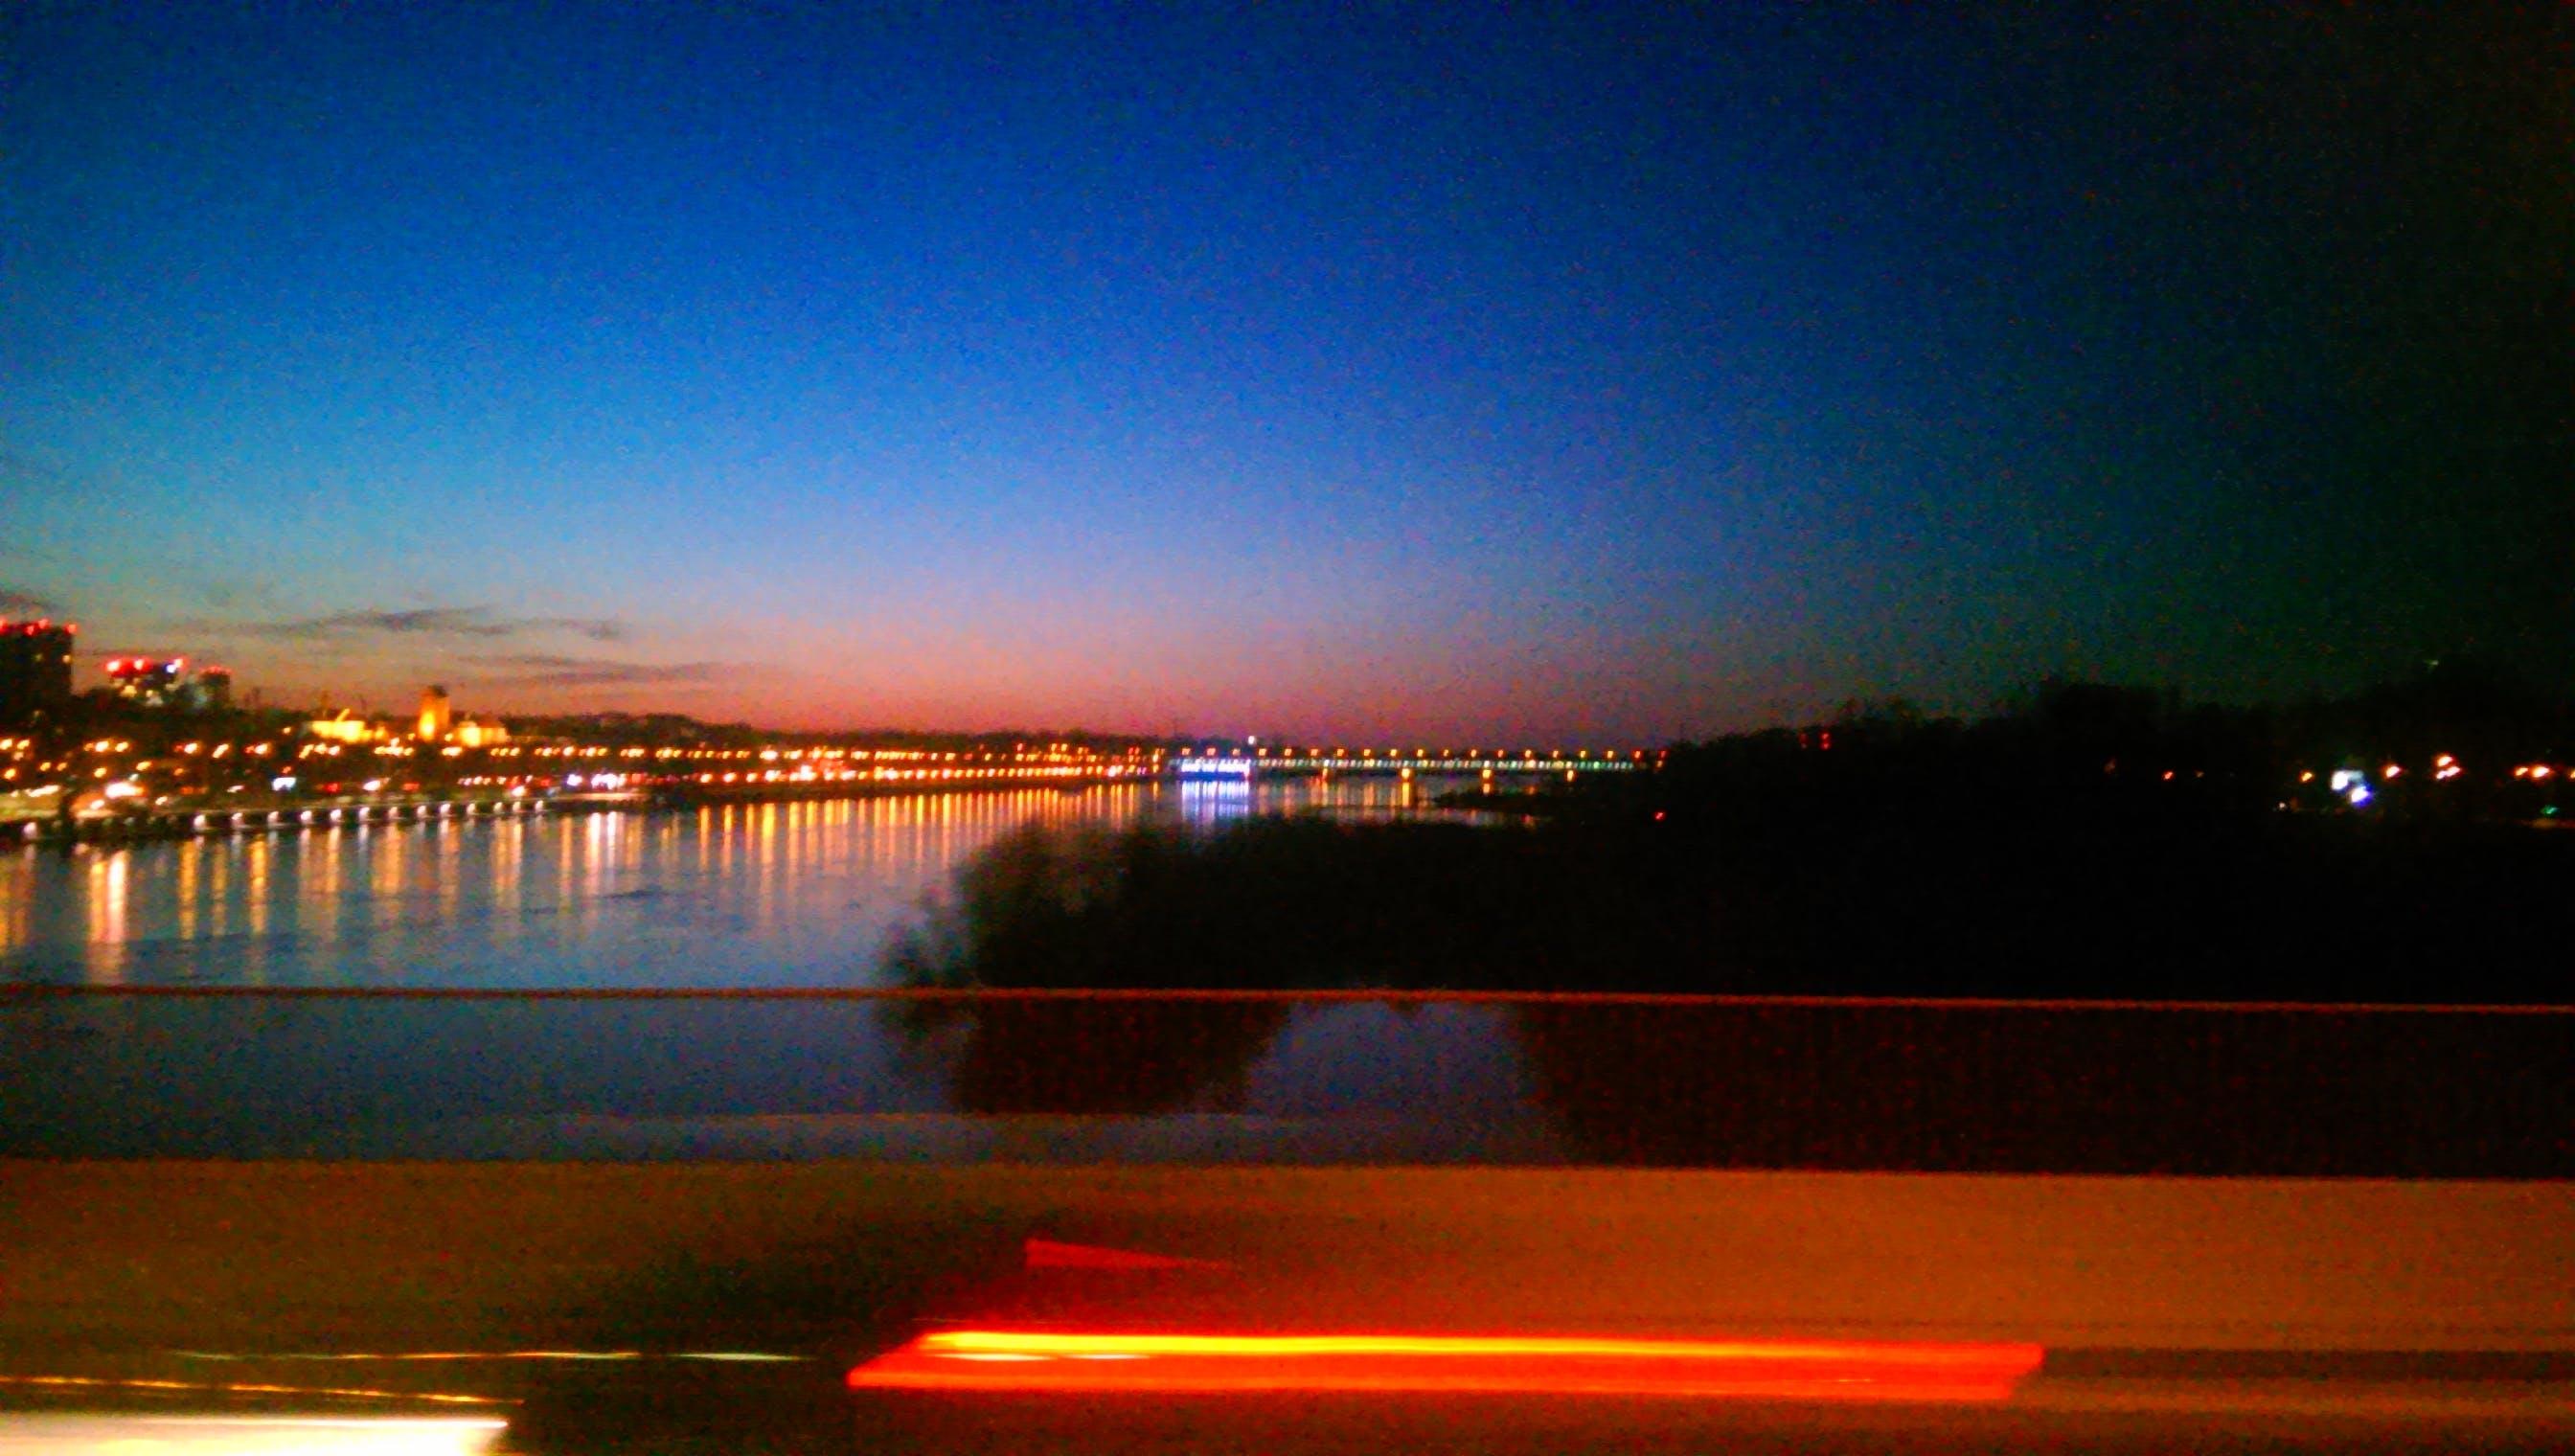 Free stock photo of sky, lights, bridge, river